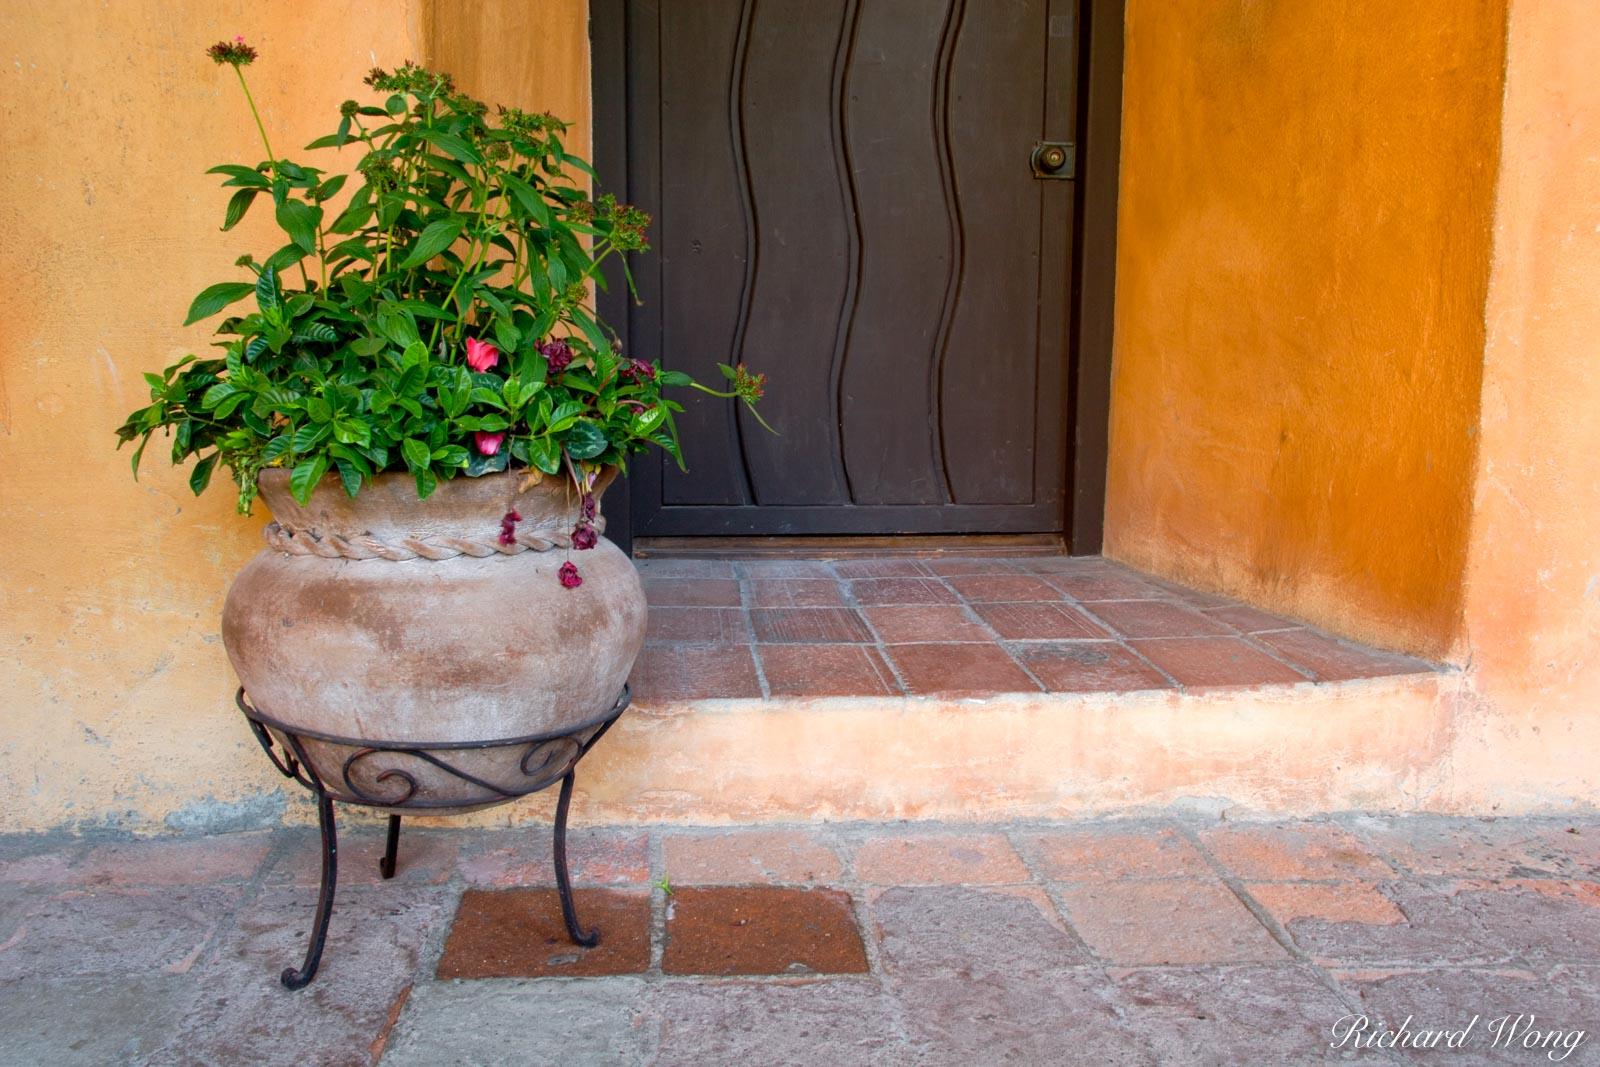 potted plant, mission san juan capistrano, california, photo, photo